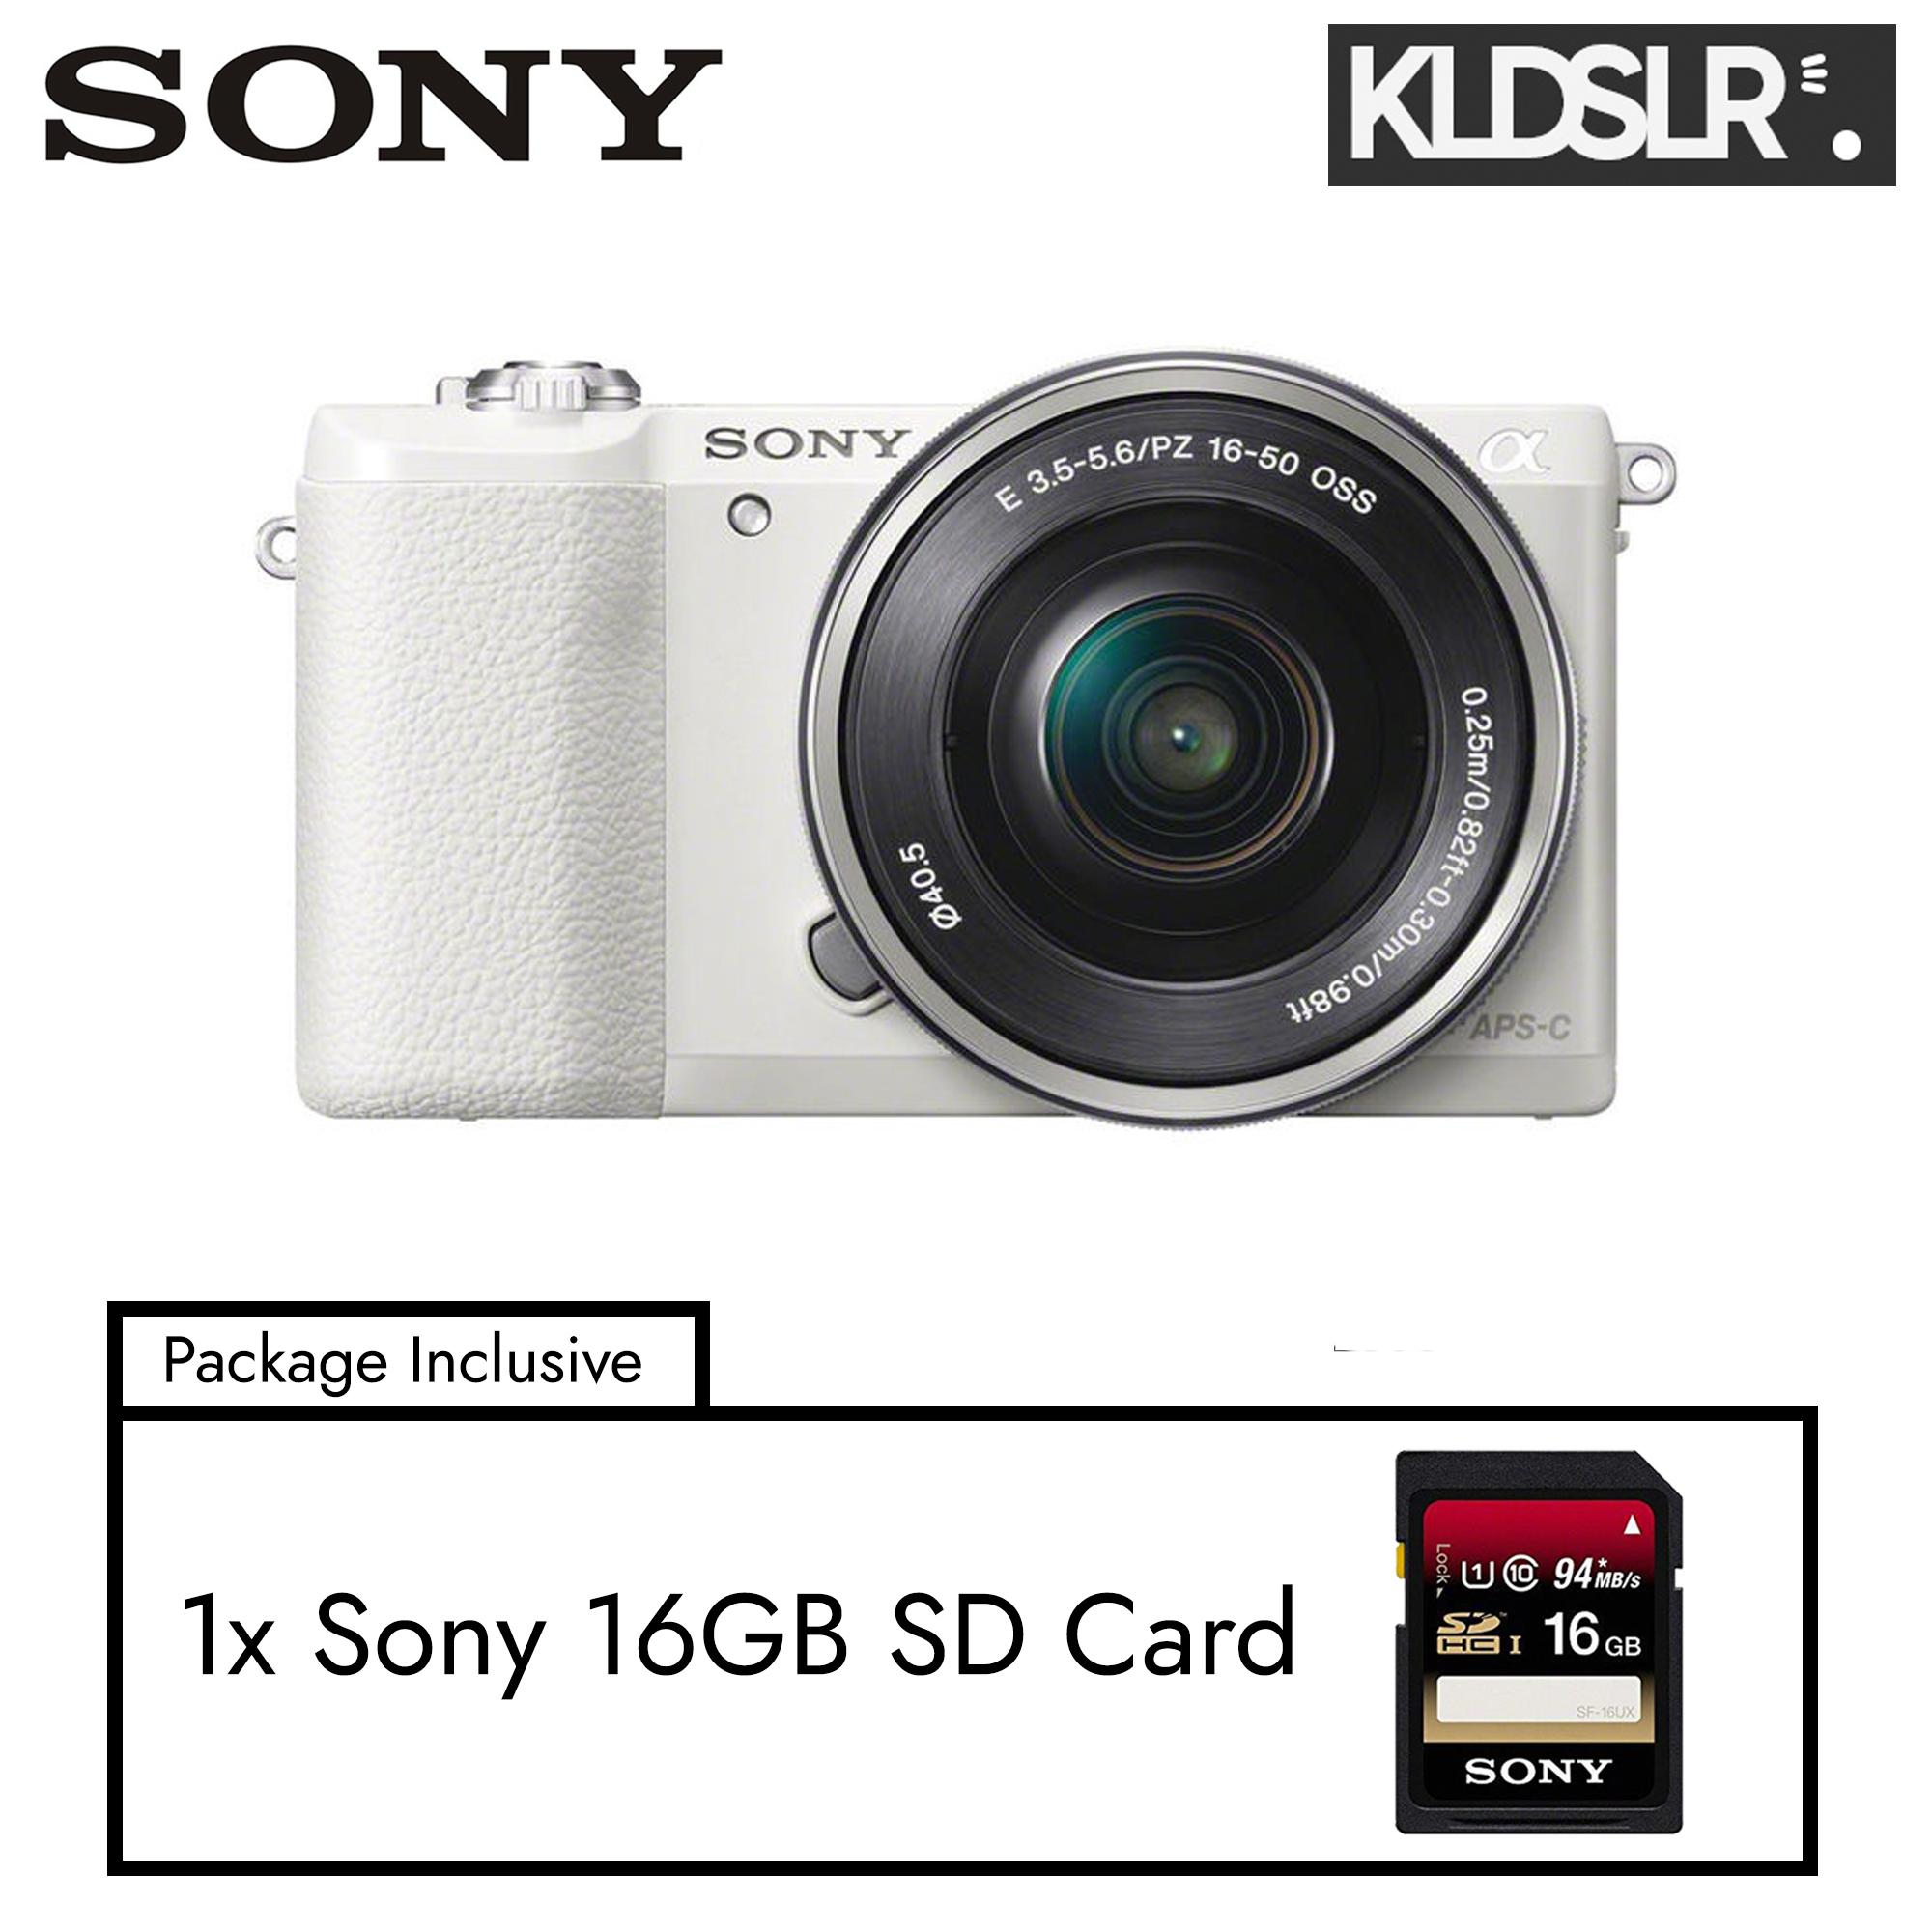 Jual Fujifilm X T100 Body Only Instax Mini 8 Free Sdhc 16gb Black Kit Xc15 45mm F 35 56 Ois Pz Pwp Xf 50mm 2 Sony Alpha A5100 Mirrorless Digital Camera With 16 Lens White